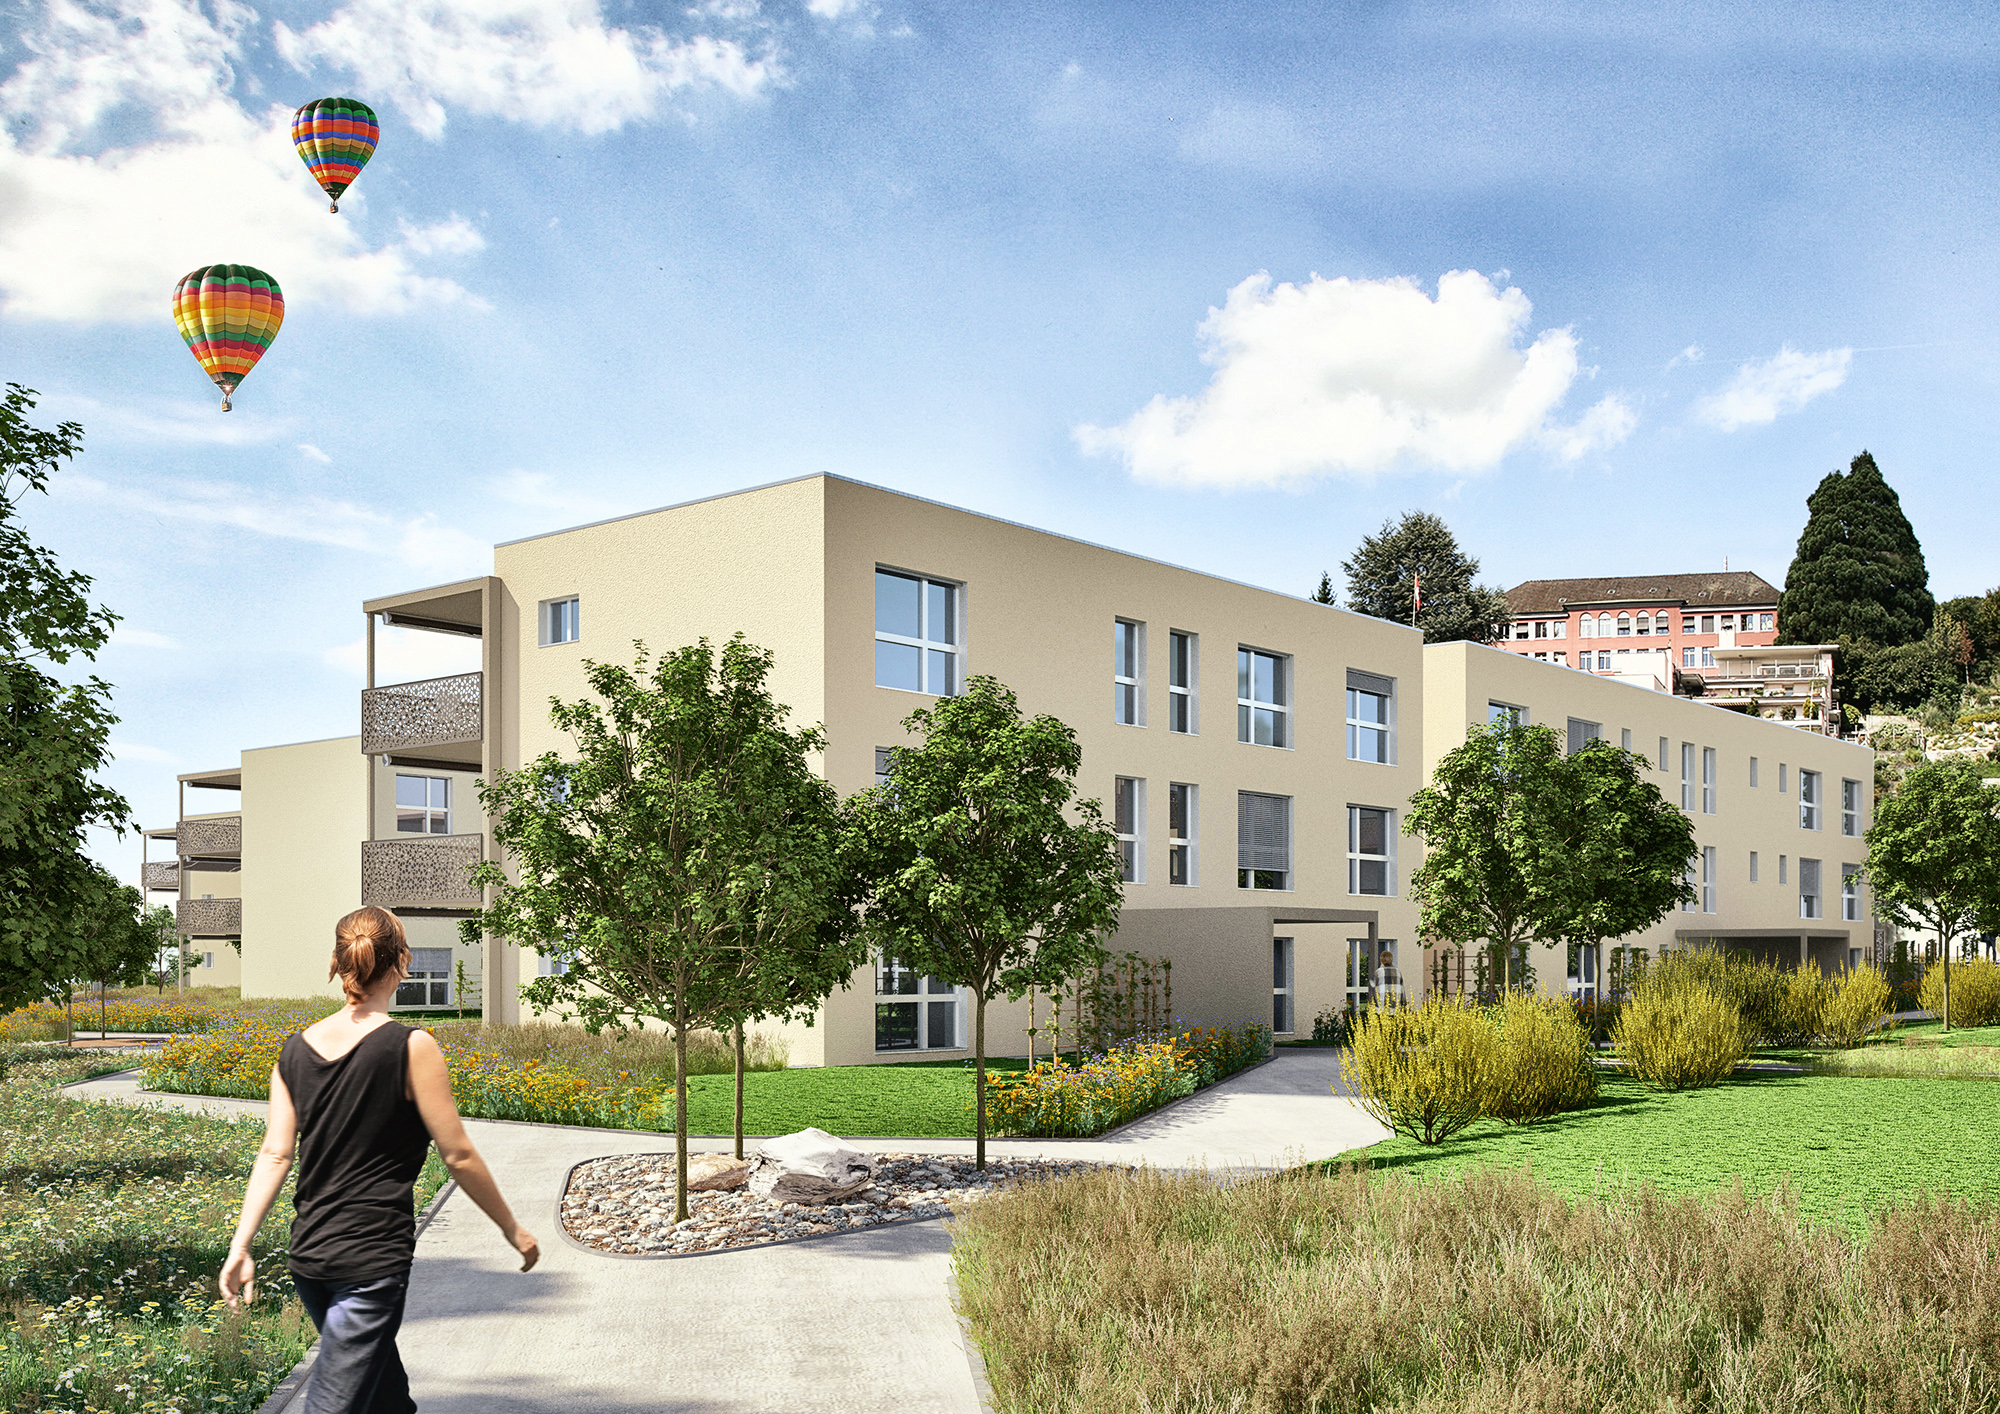 Anjana Perera Visualisierung - Jonerpark Klingnau -  Baugesellschaft Jonermatte, Bern